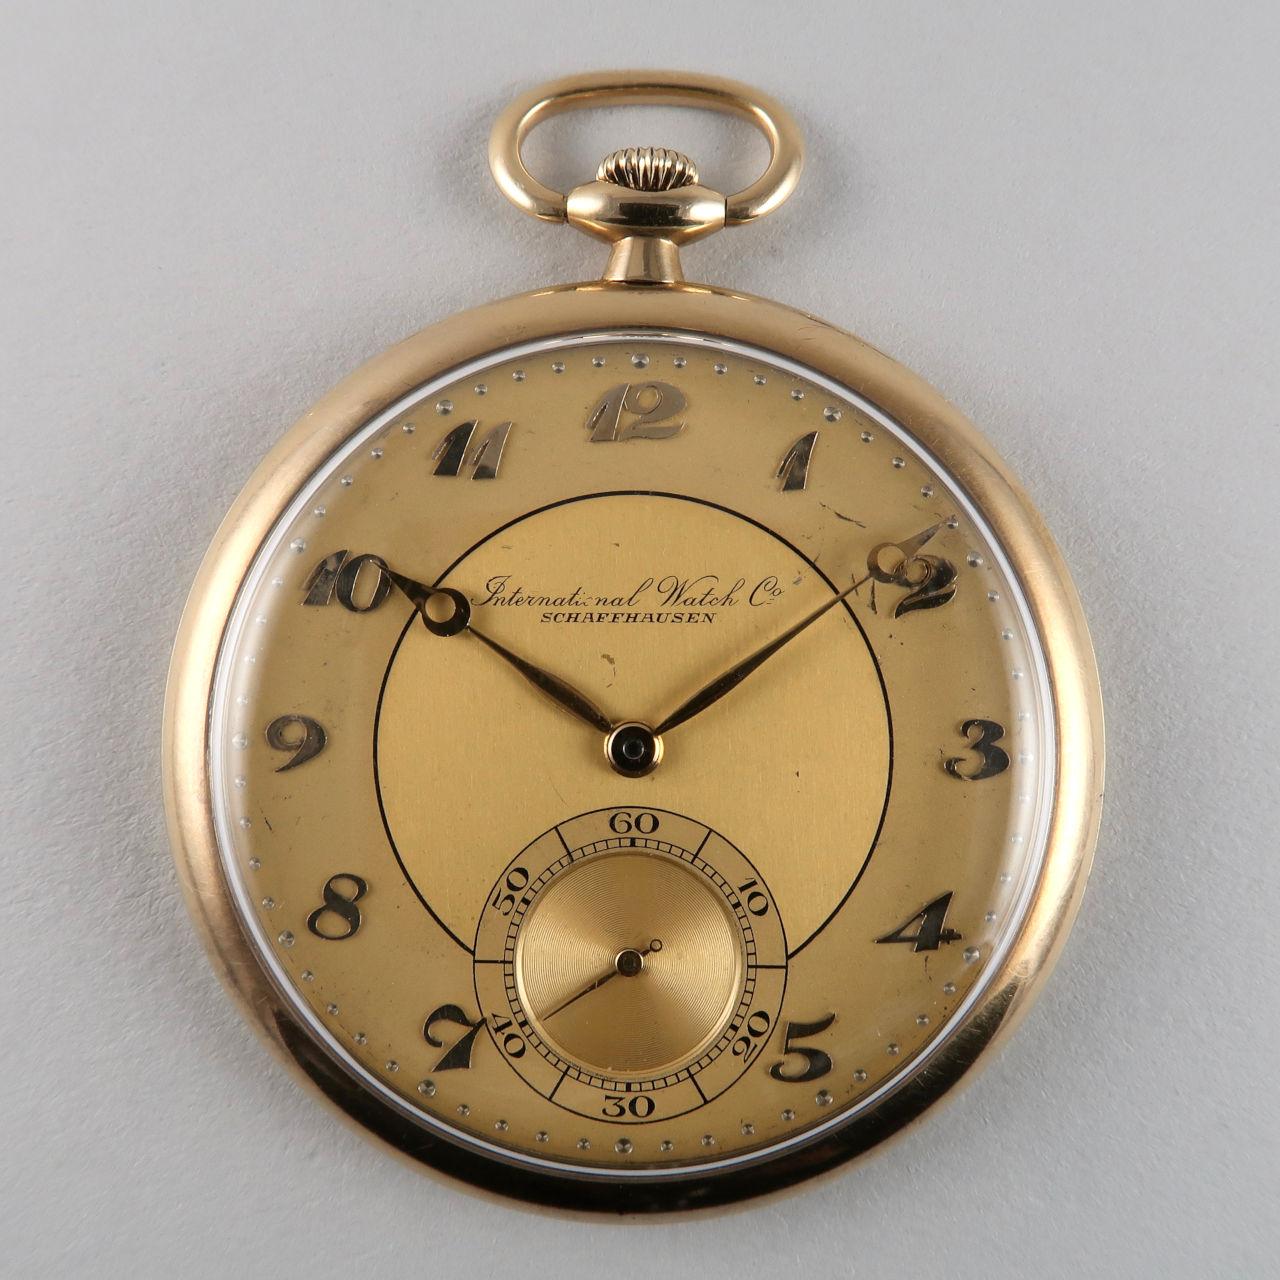 International Watch Co. cal. 95 circa 1928